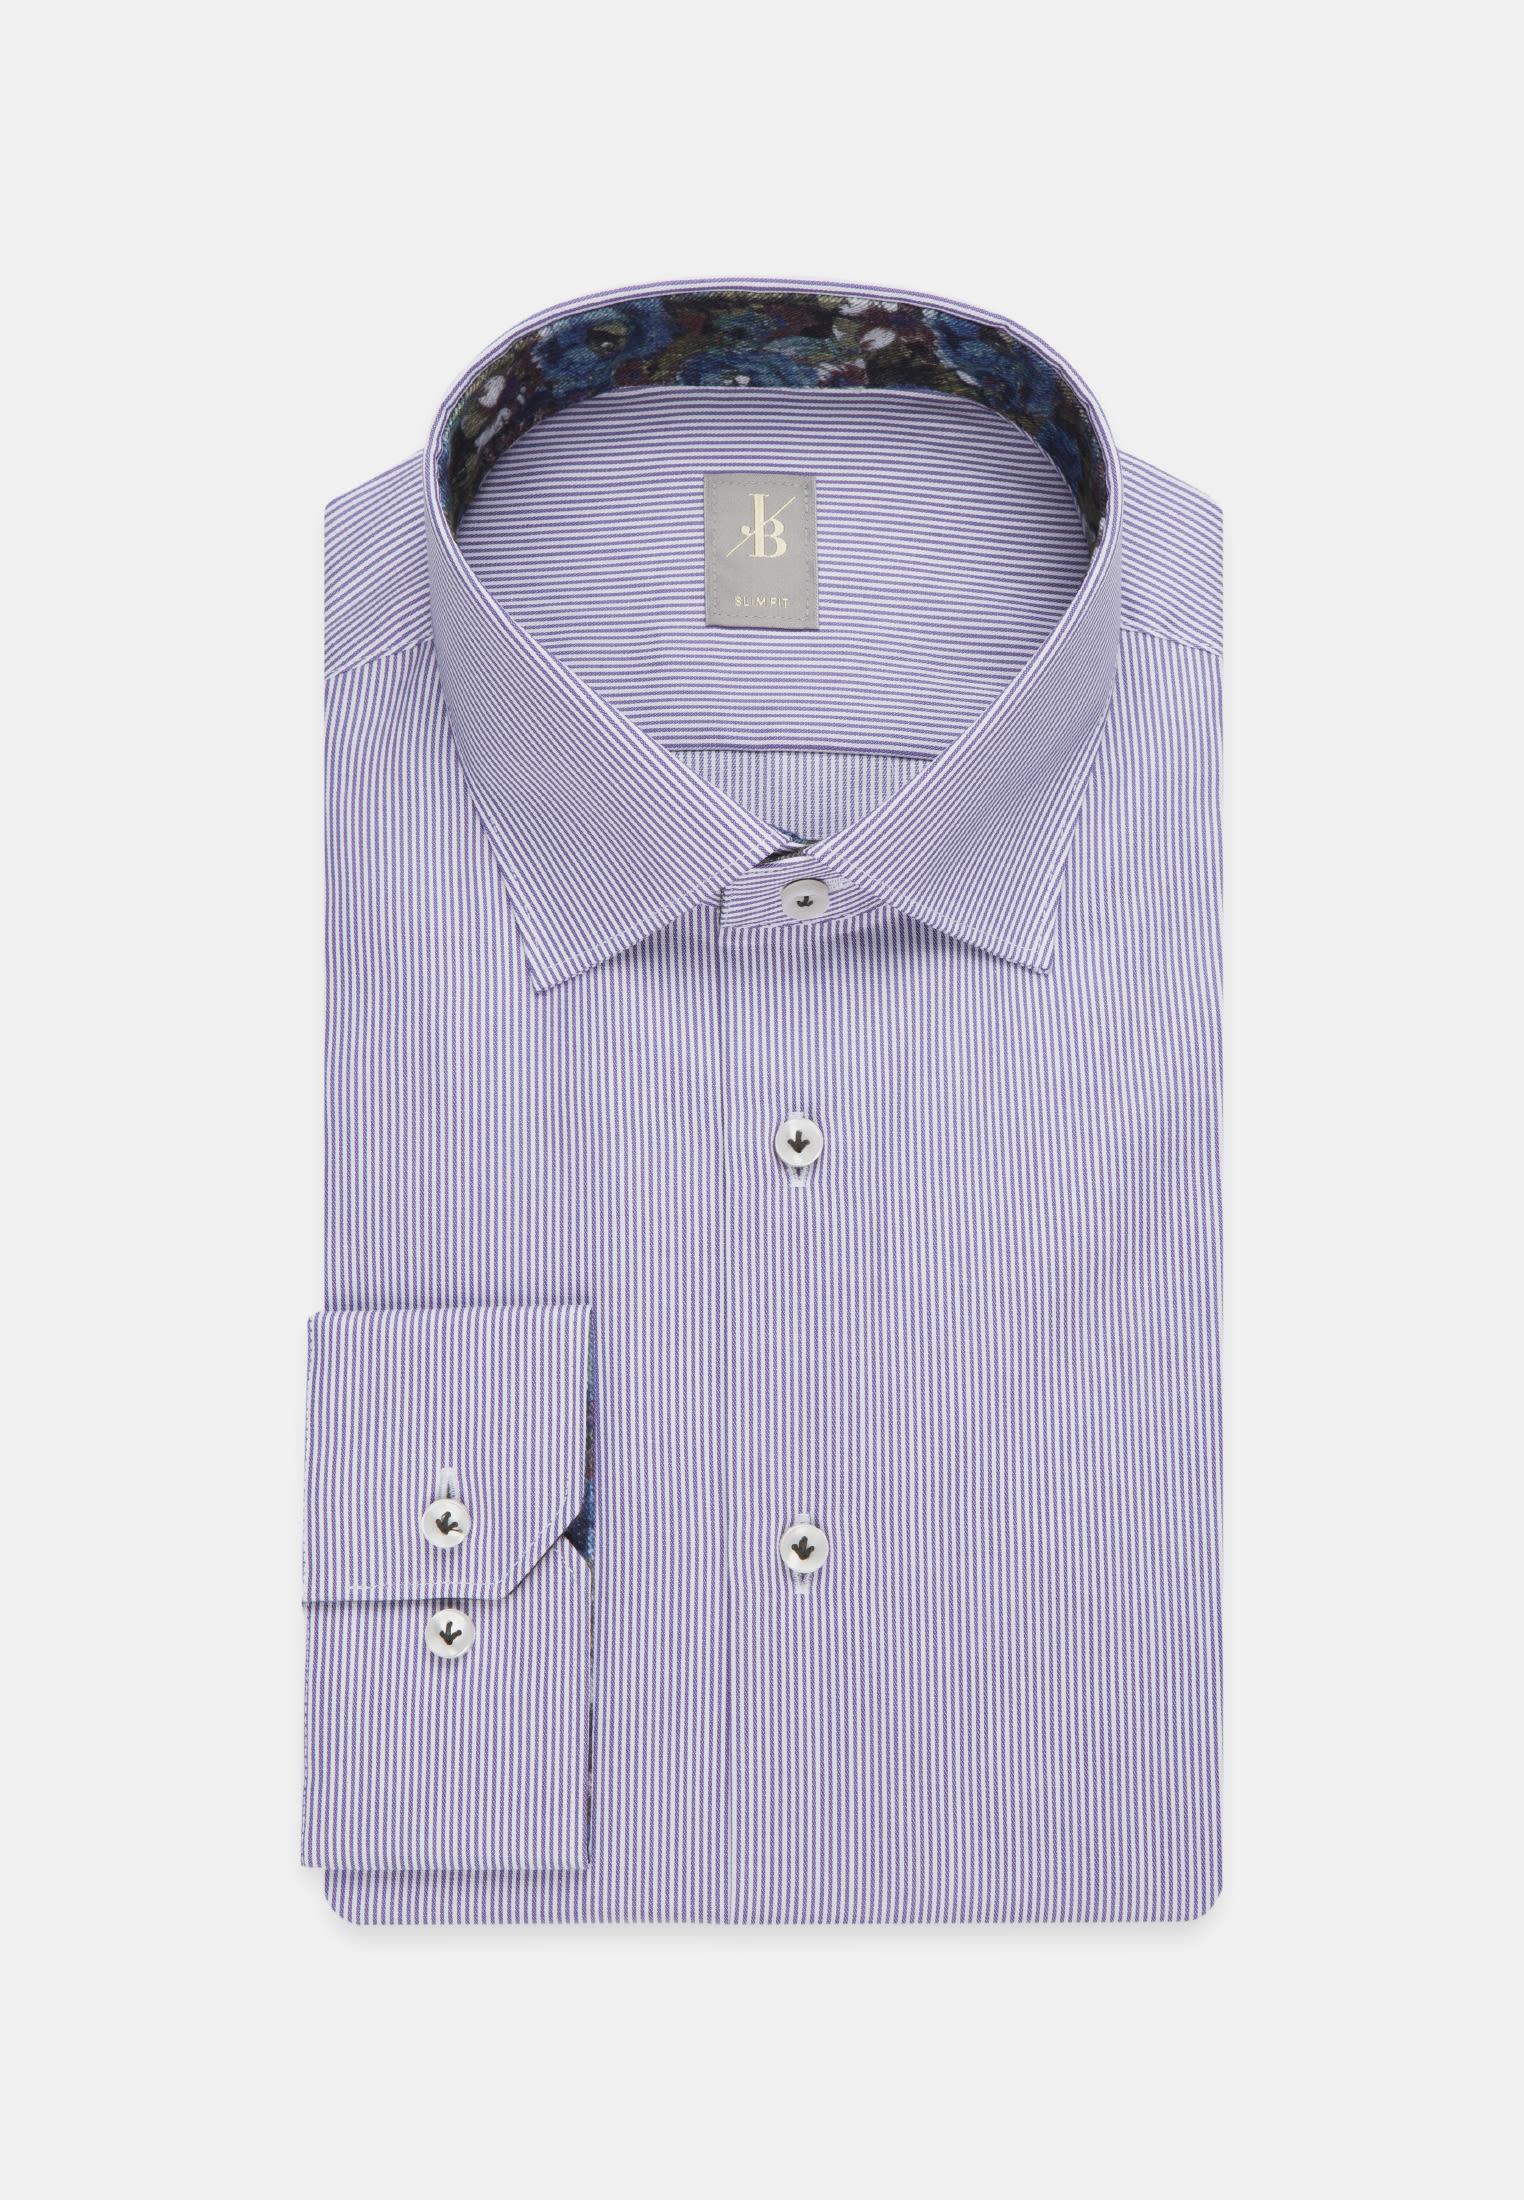 Twill Business Hemd in Slim Fit mit Kentkragen in Lila    Jacques Britt Onlineshop